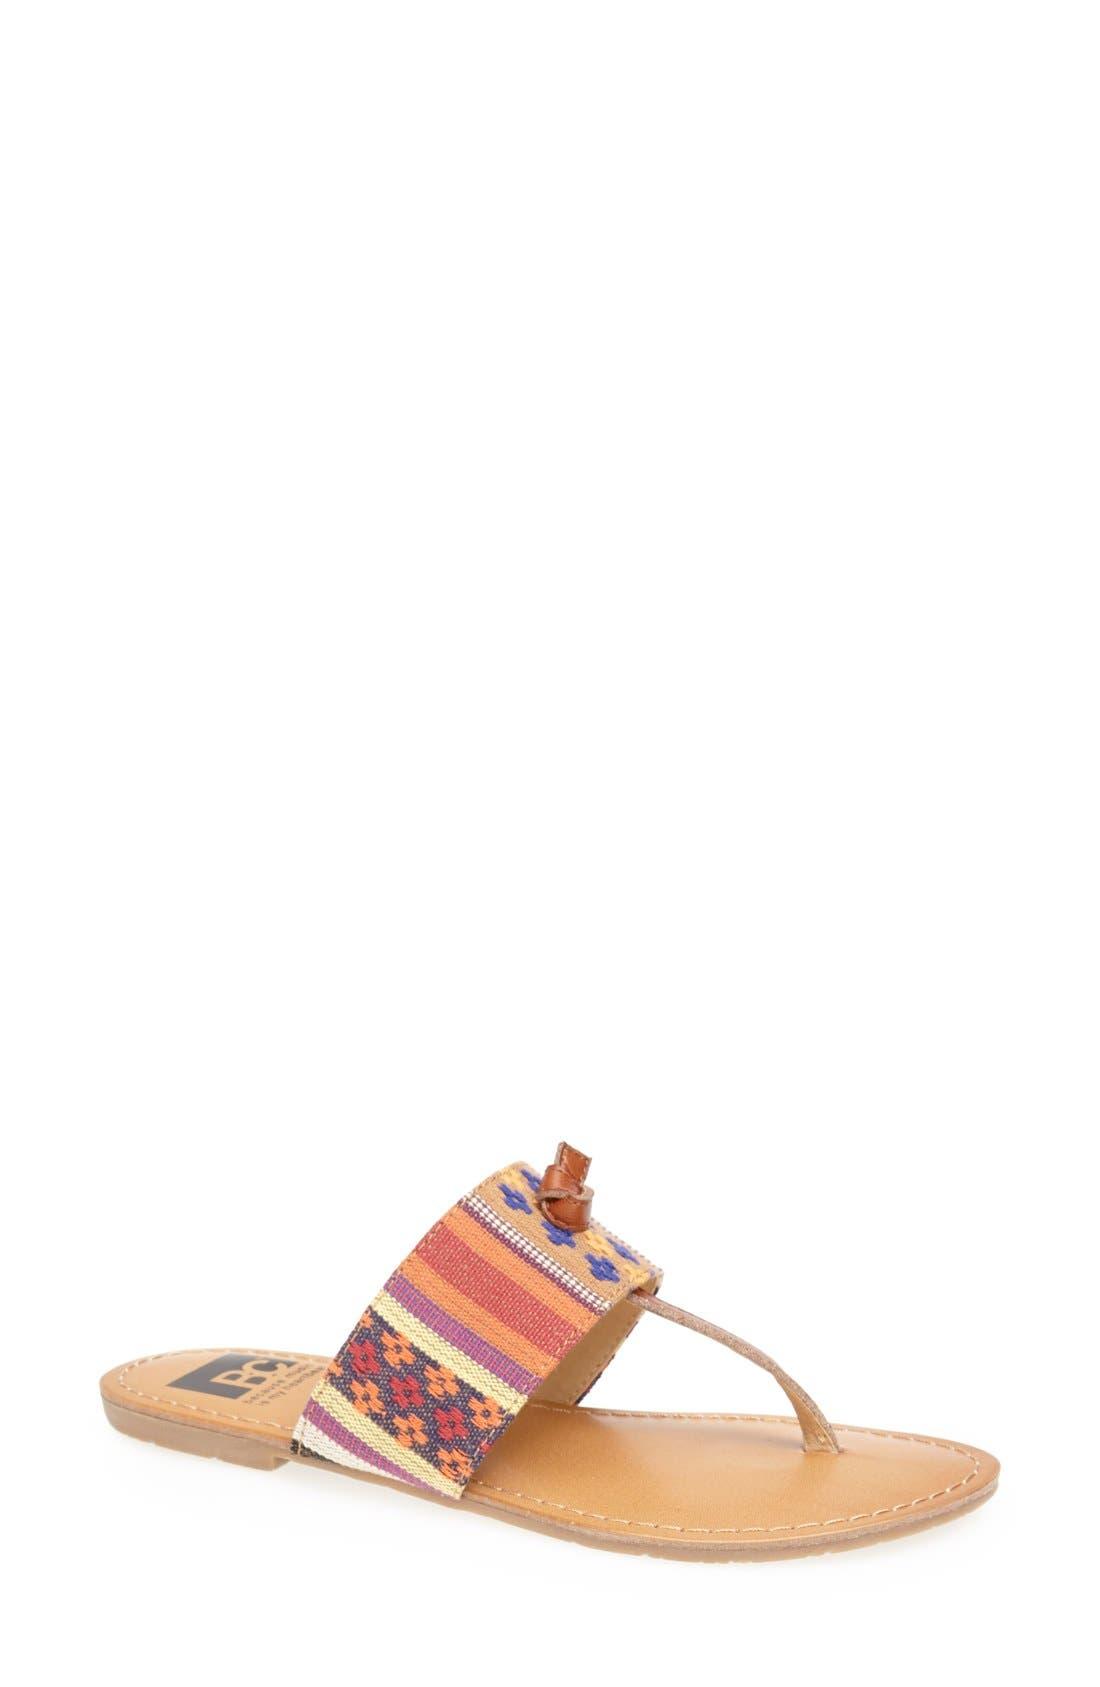 Main Image - BC Footwear 'Gotta Try' Thong Sandal (Women)